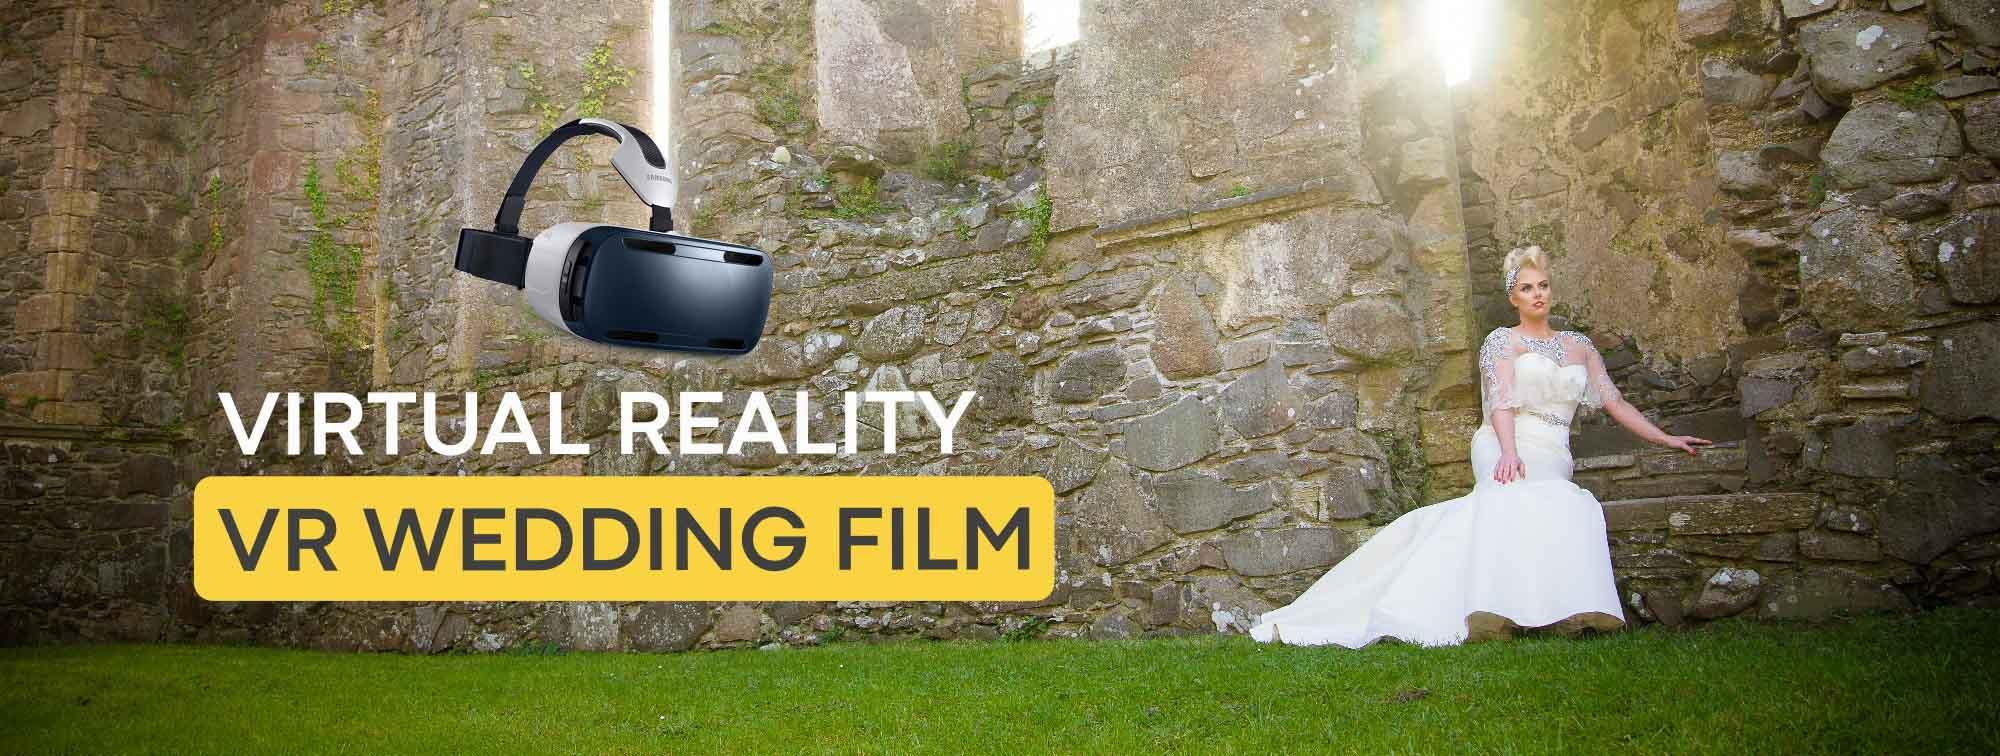 Virtual reality wedding film